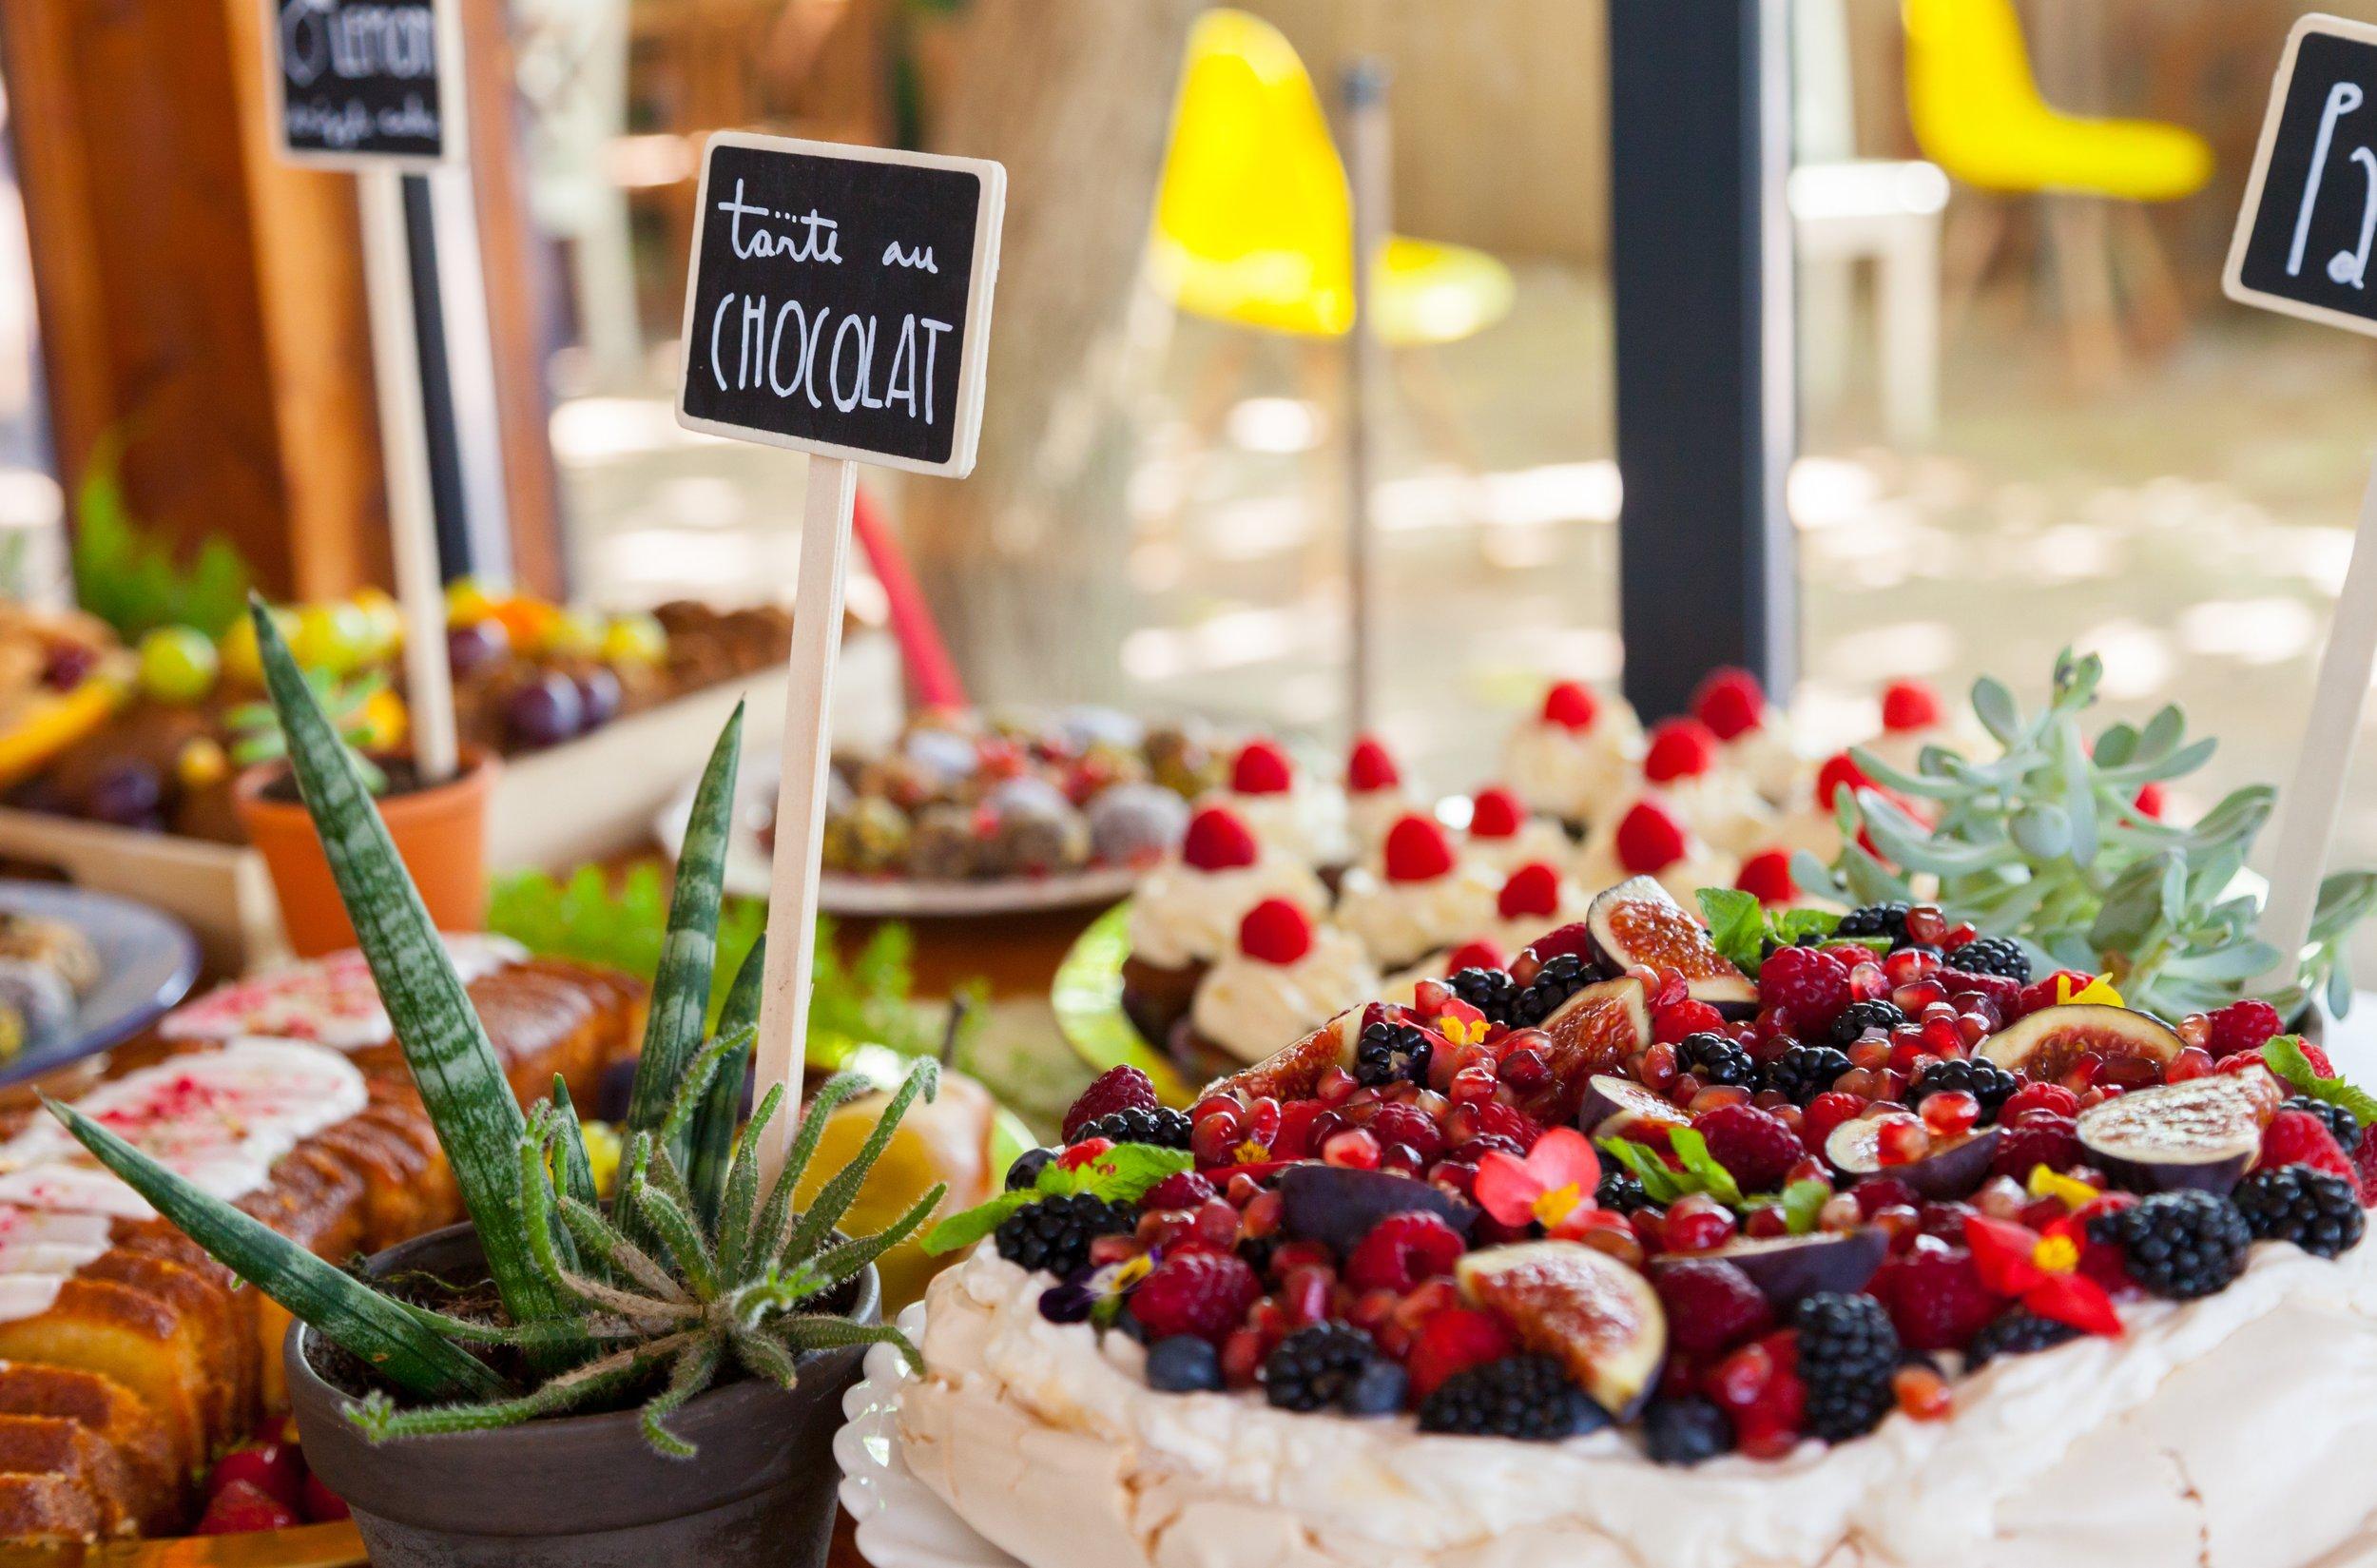 cake-chocolate-delicious-1485805.jpg